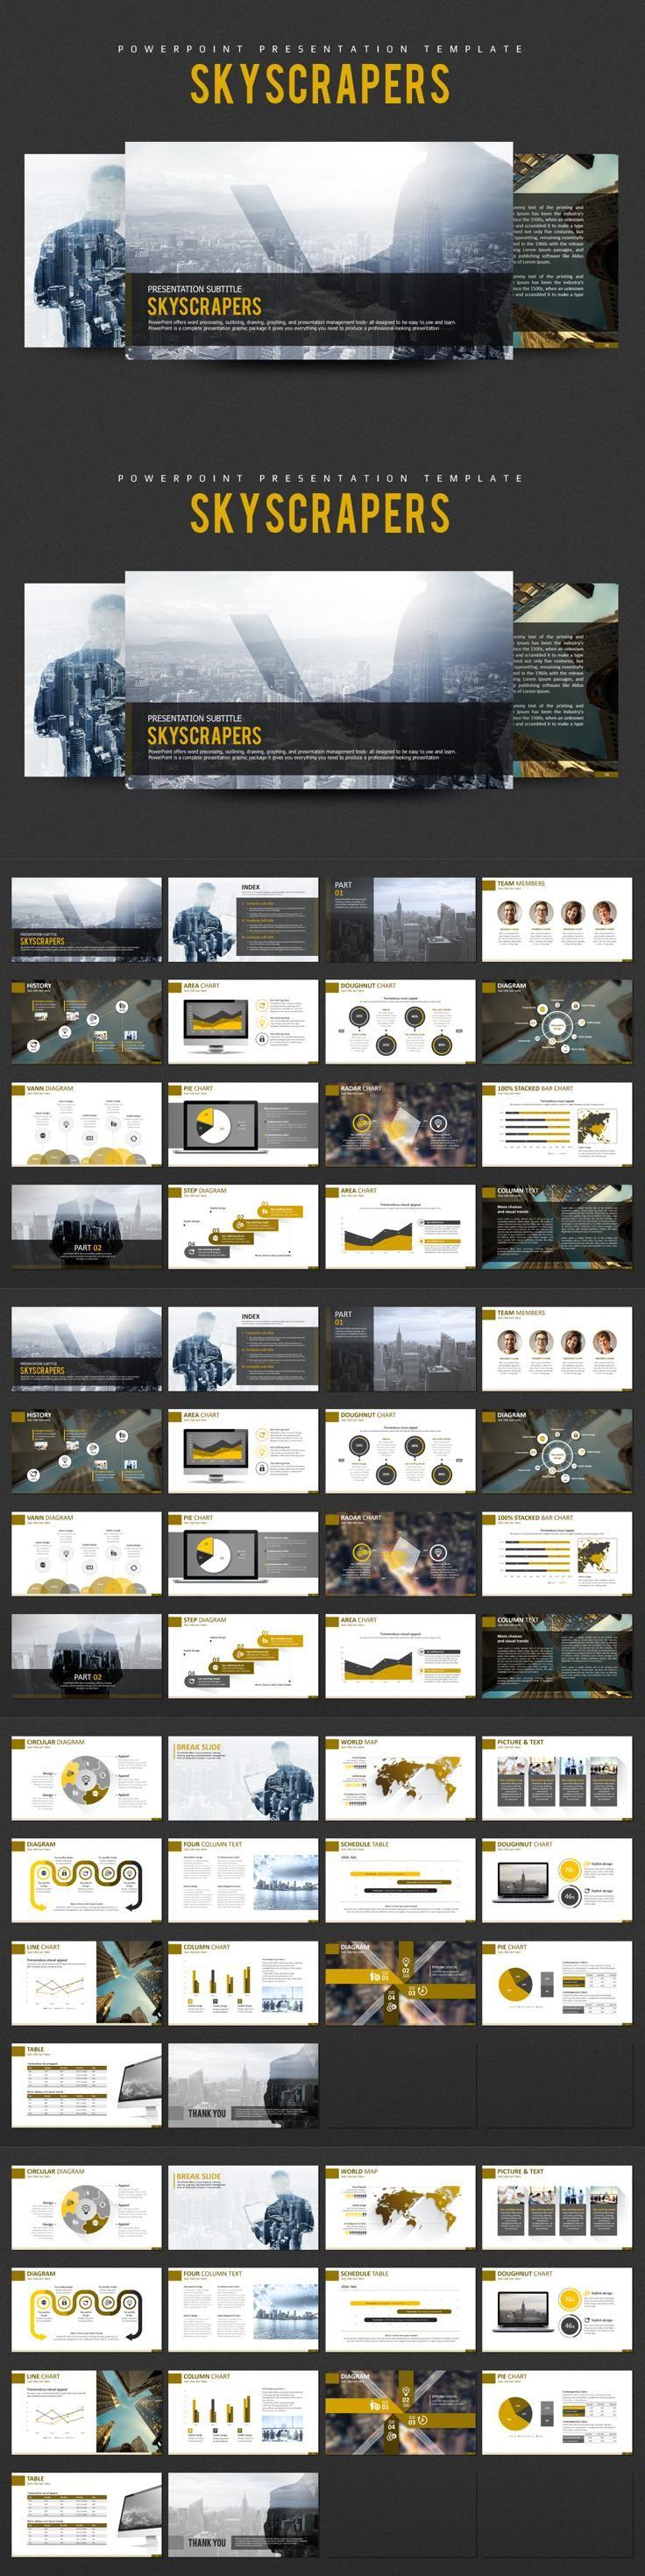 #presentation #template from Good Pello | DOWNLOAD: https://creativemarket.com/alecwang1103/716003-Skyscrapers-PPT-Template?u=zsoltczigler